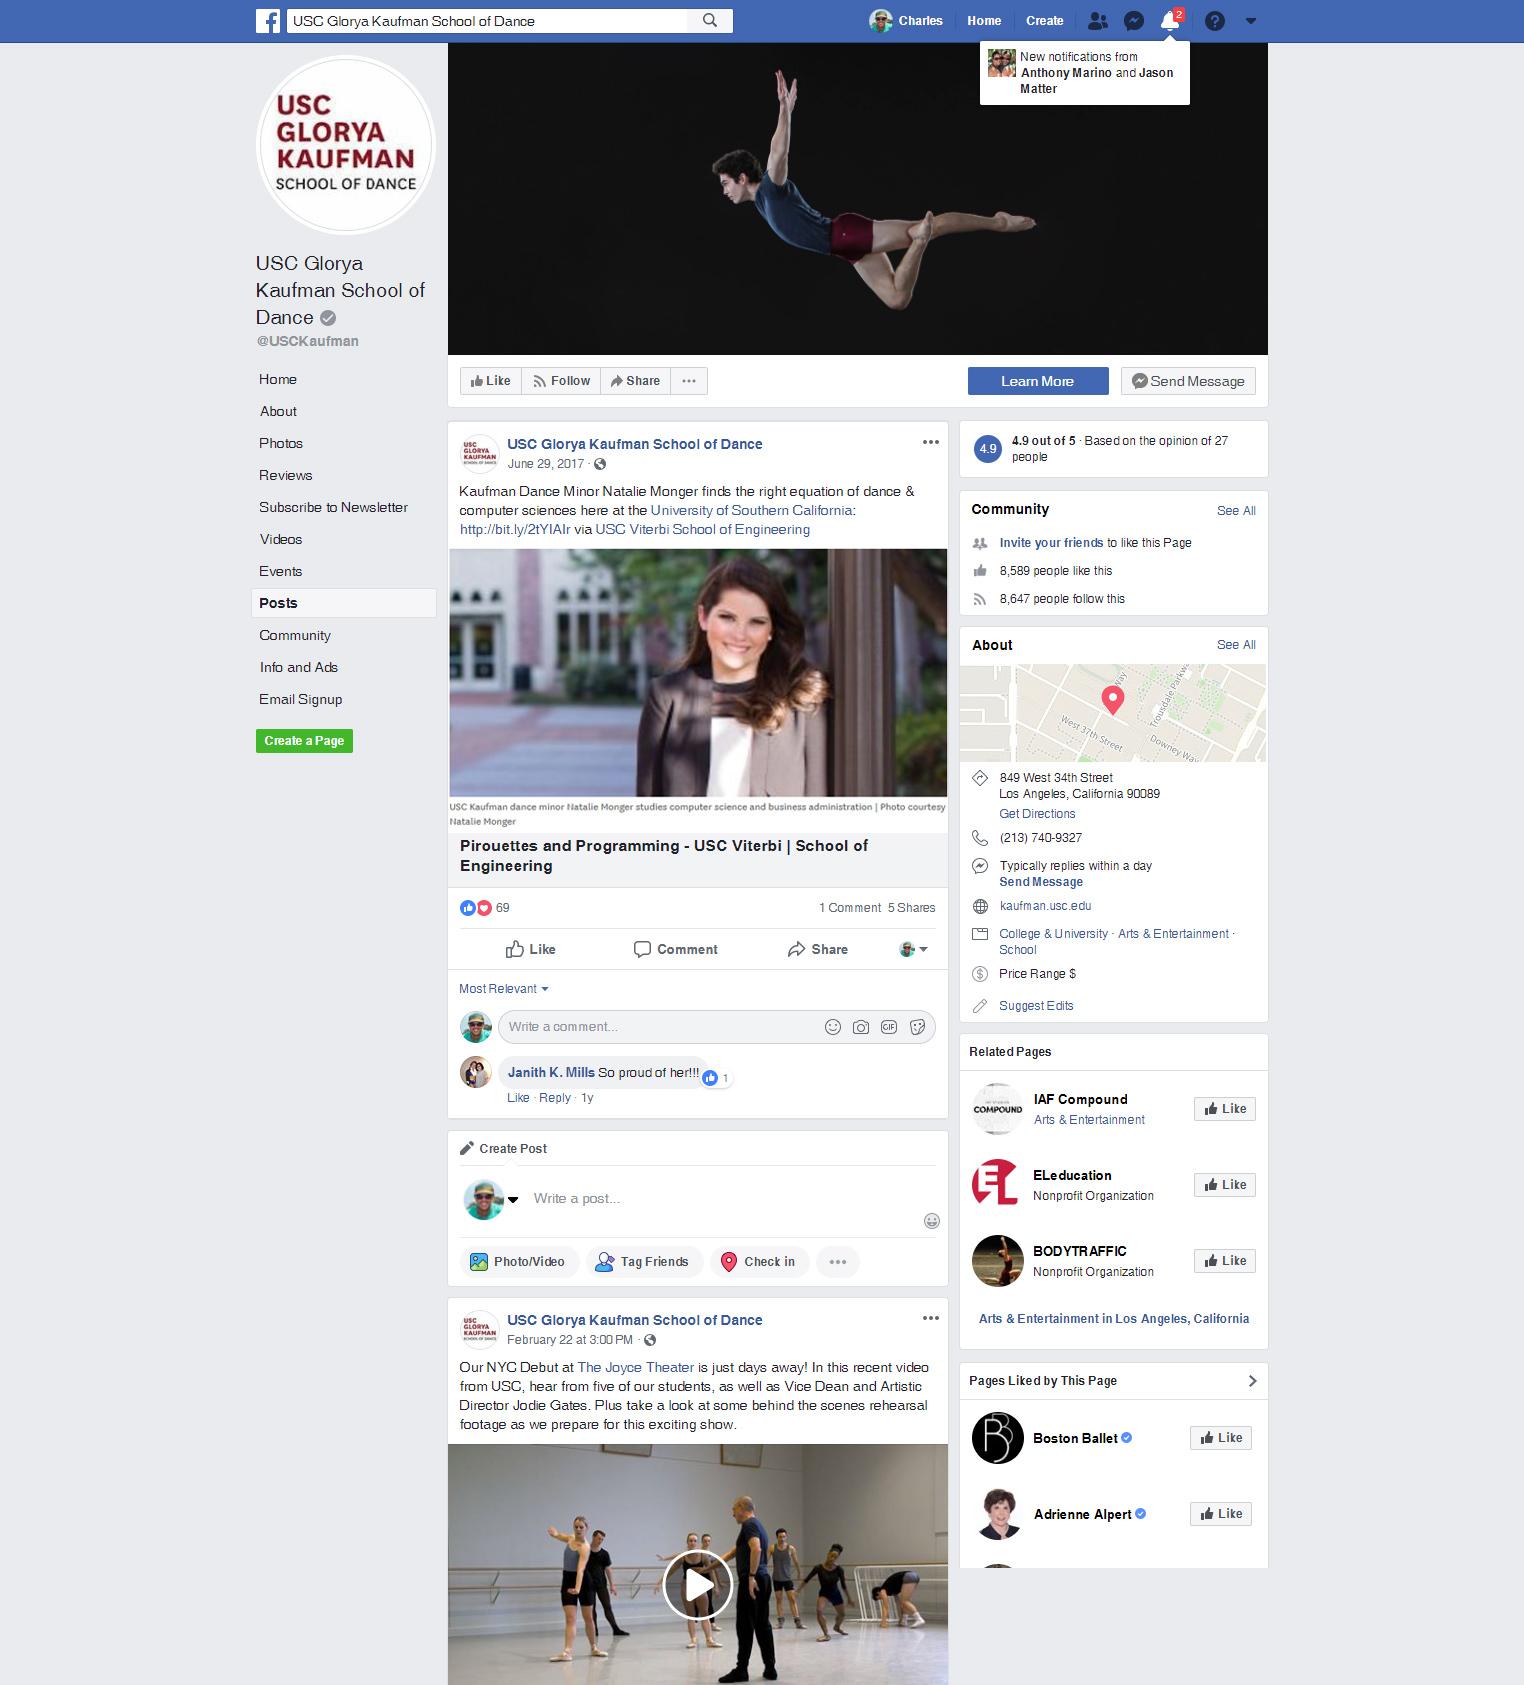 screencapture-facebook-USCKaufman-posts-kaufman-dance-minor-natalie-monger-finds-the-right-equation-of-dance-computer-sc-2019572568271644-2019-02-25-10_27_41.jpg